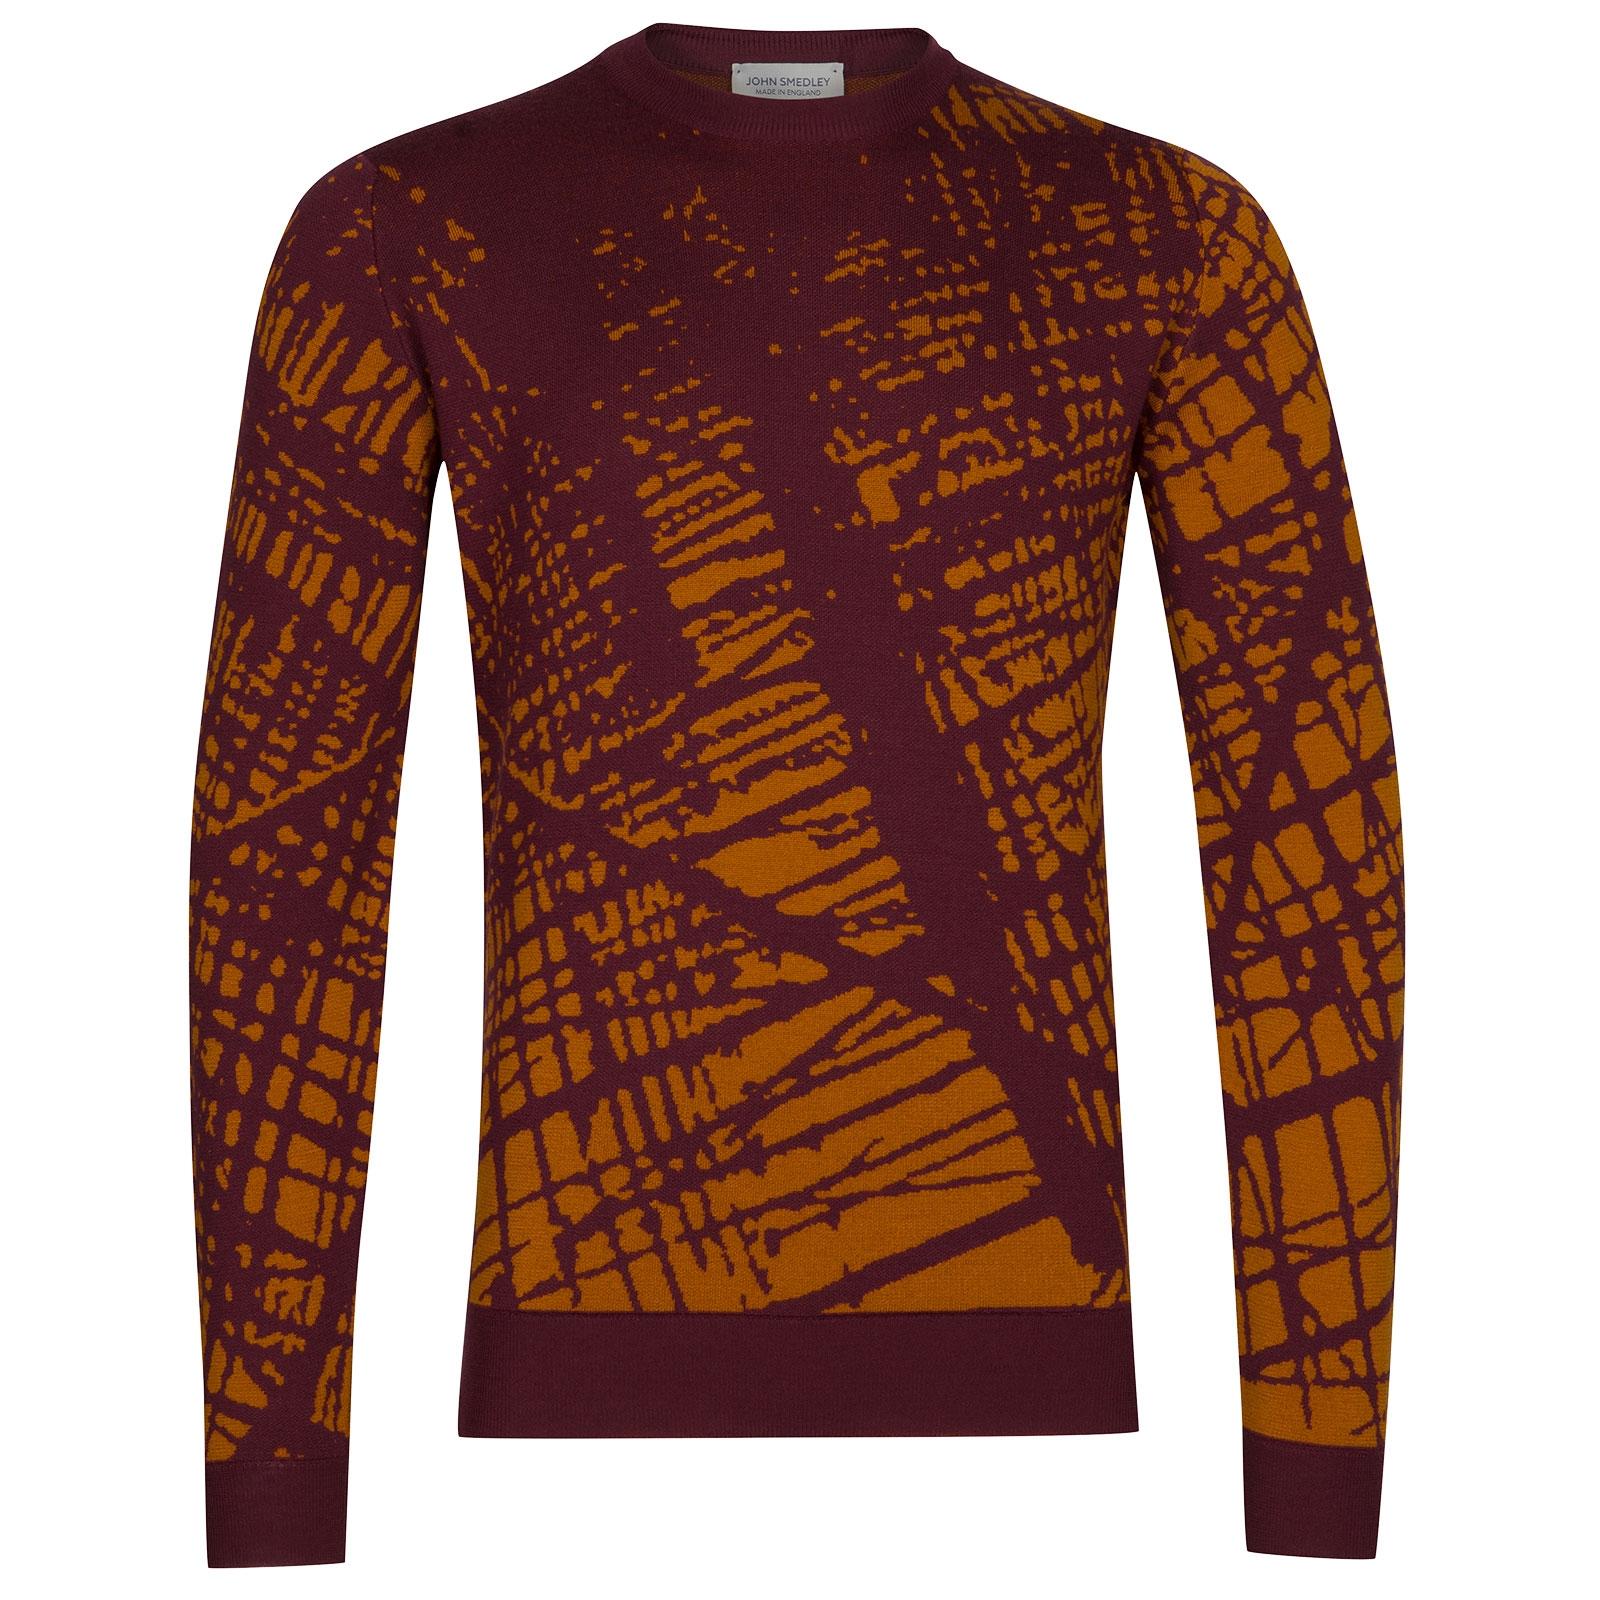 John Smedley Sagan Extra Fine Merino Wool Pullover in Bordeaux-XXL